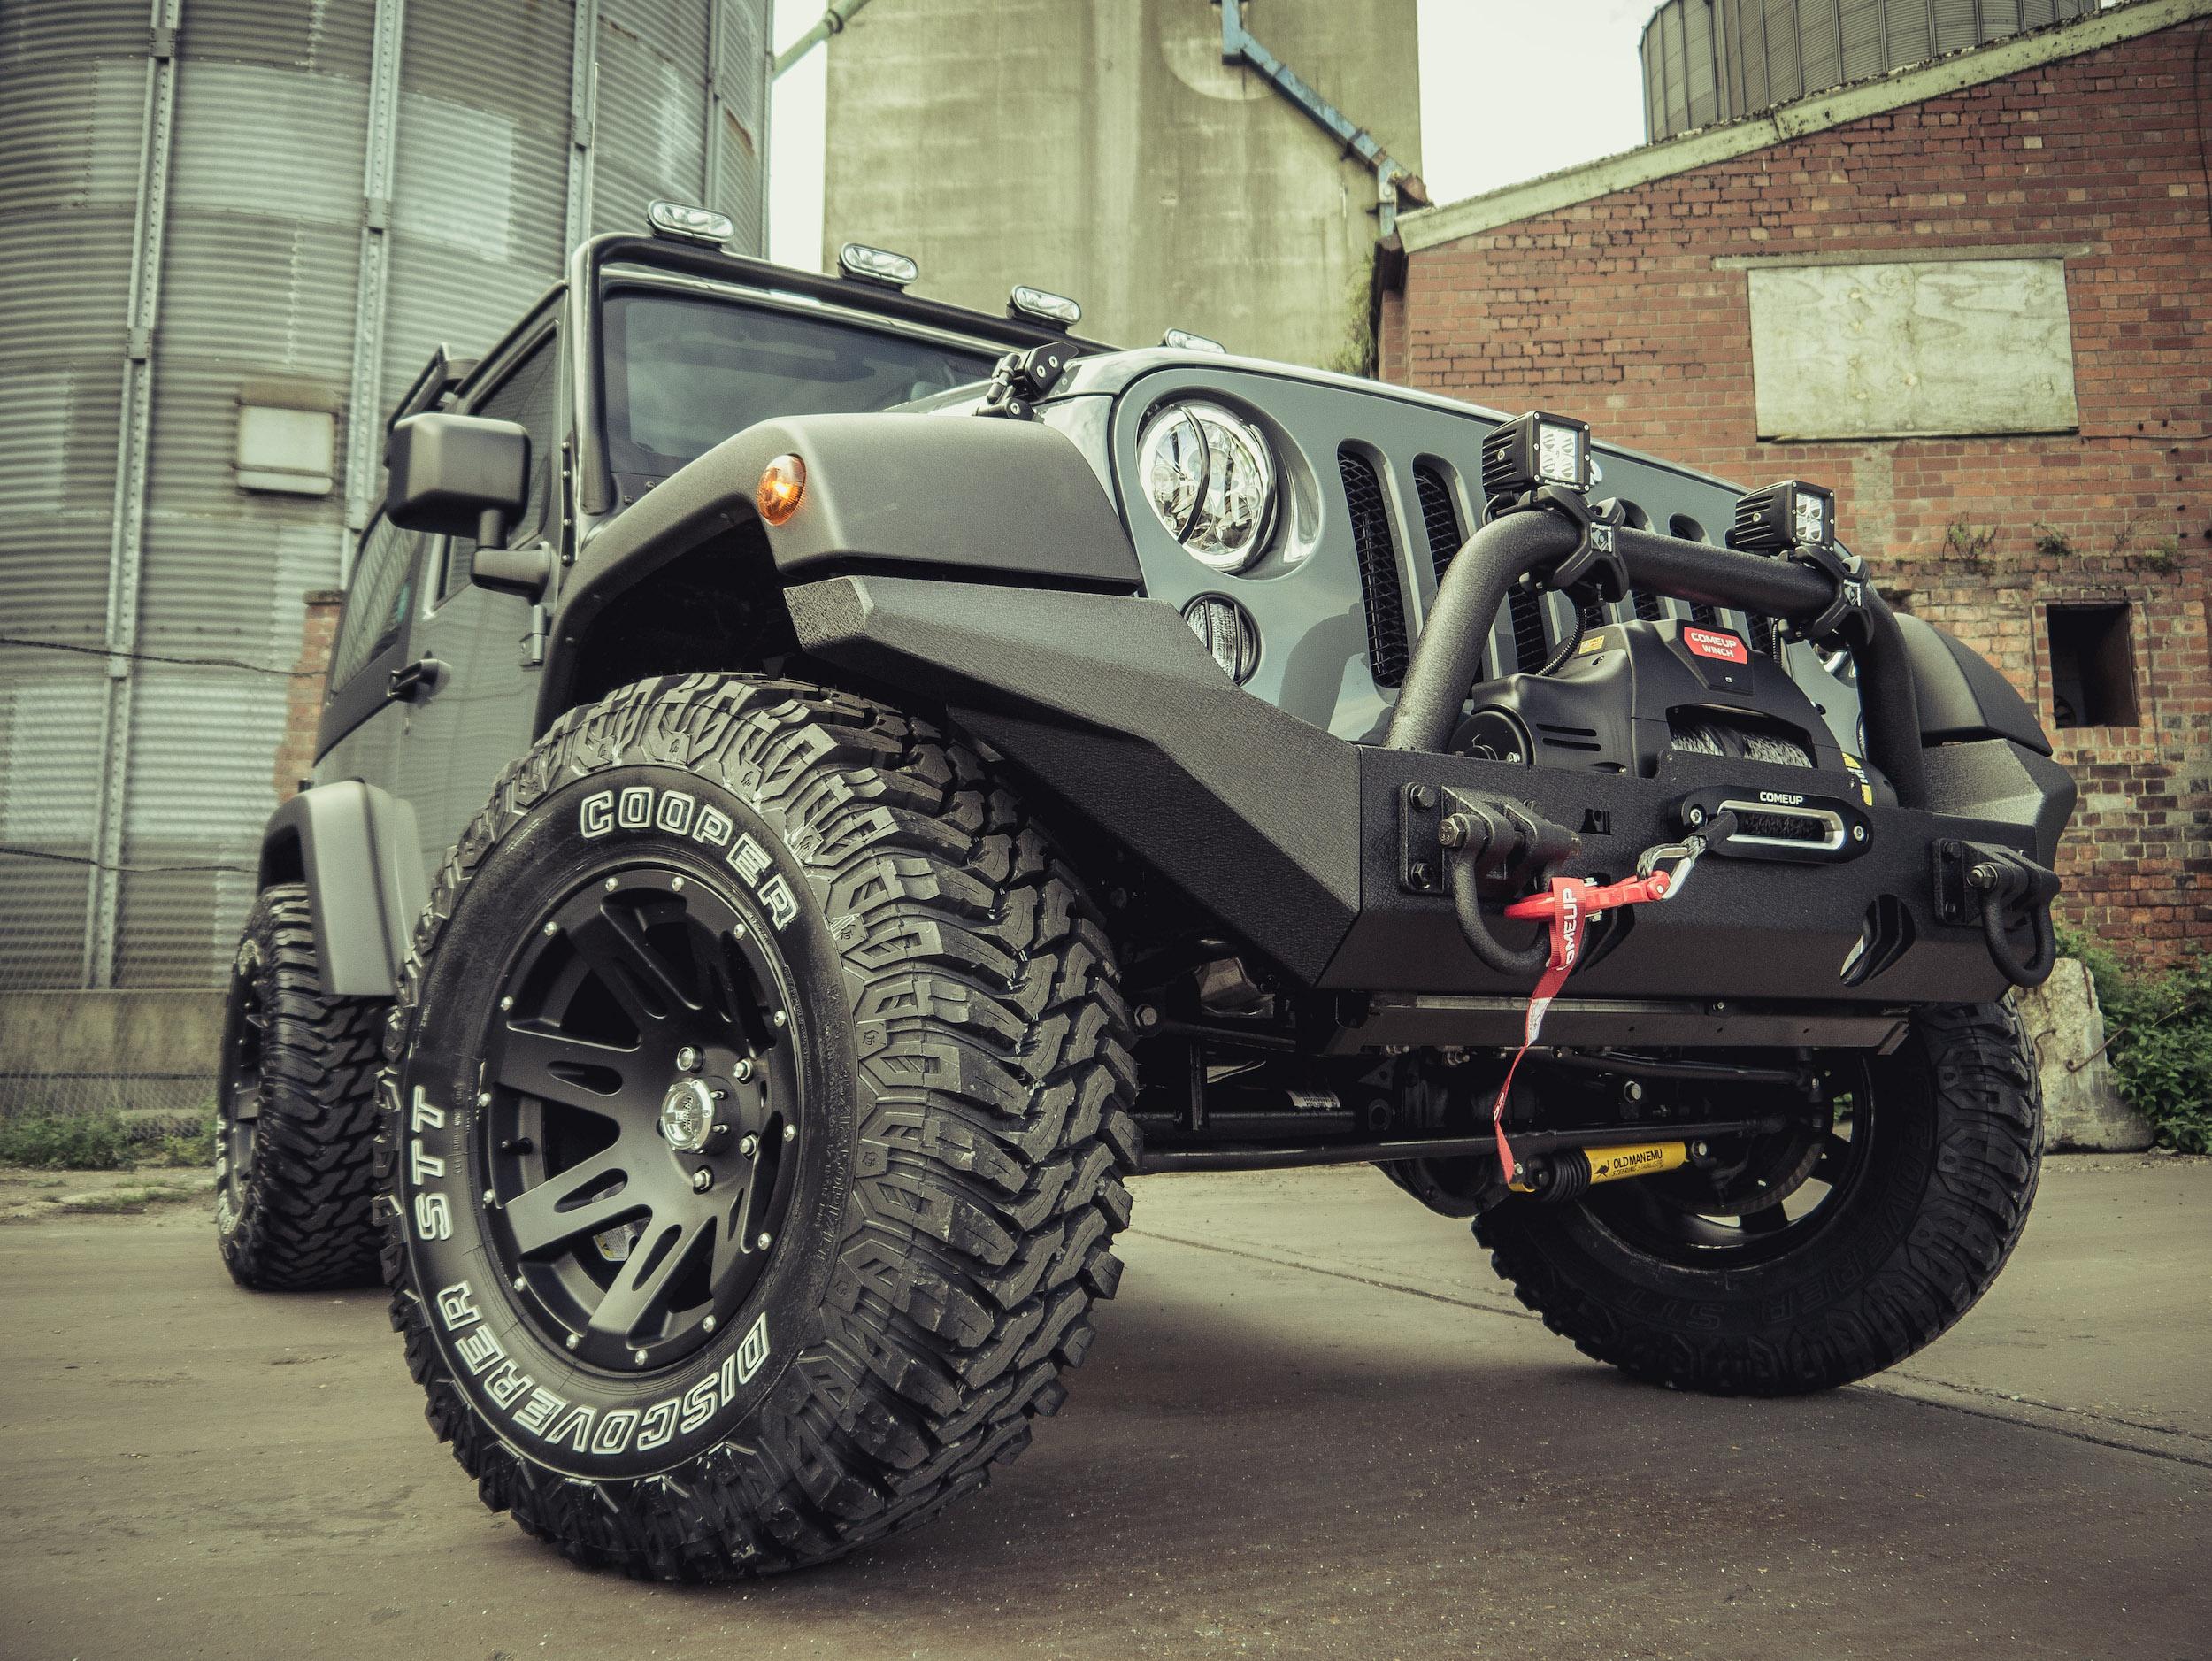 storm 3 2015 jeep wrangler rubicon 2 door 3 6l v6 showcase storm jeeps. Black Bedroom Furniture Sets. Home Design Ideas